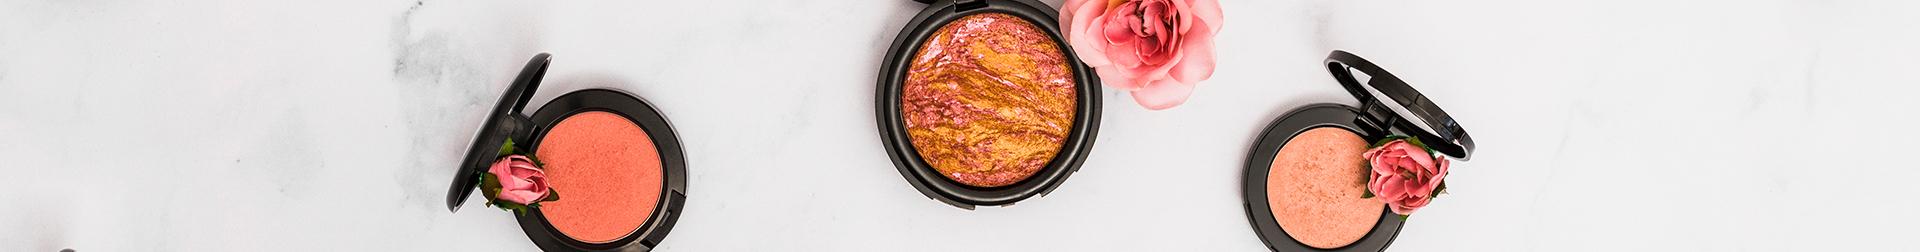 Makeup Products | Buy Compact Powder Online | AromaCraze